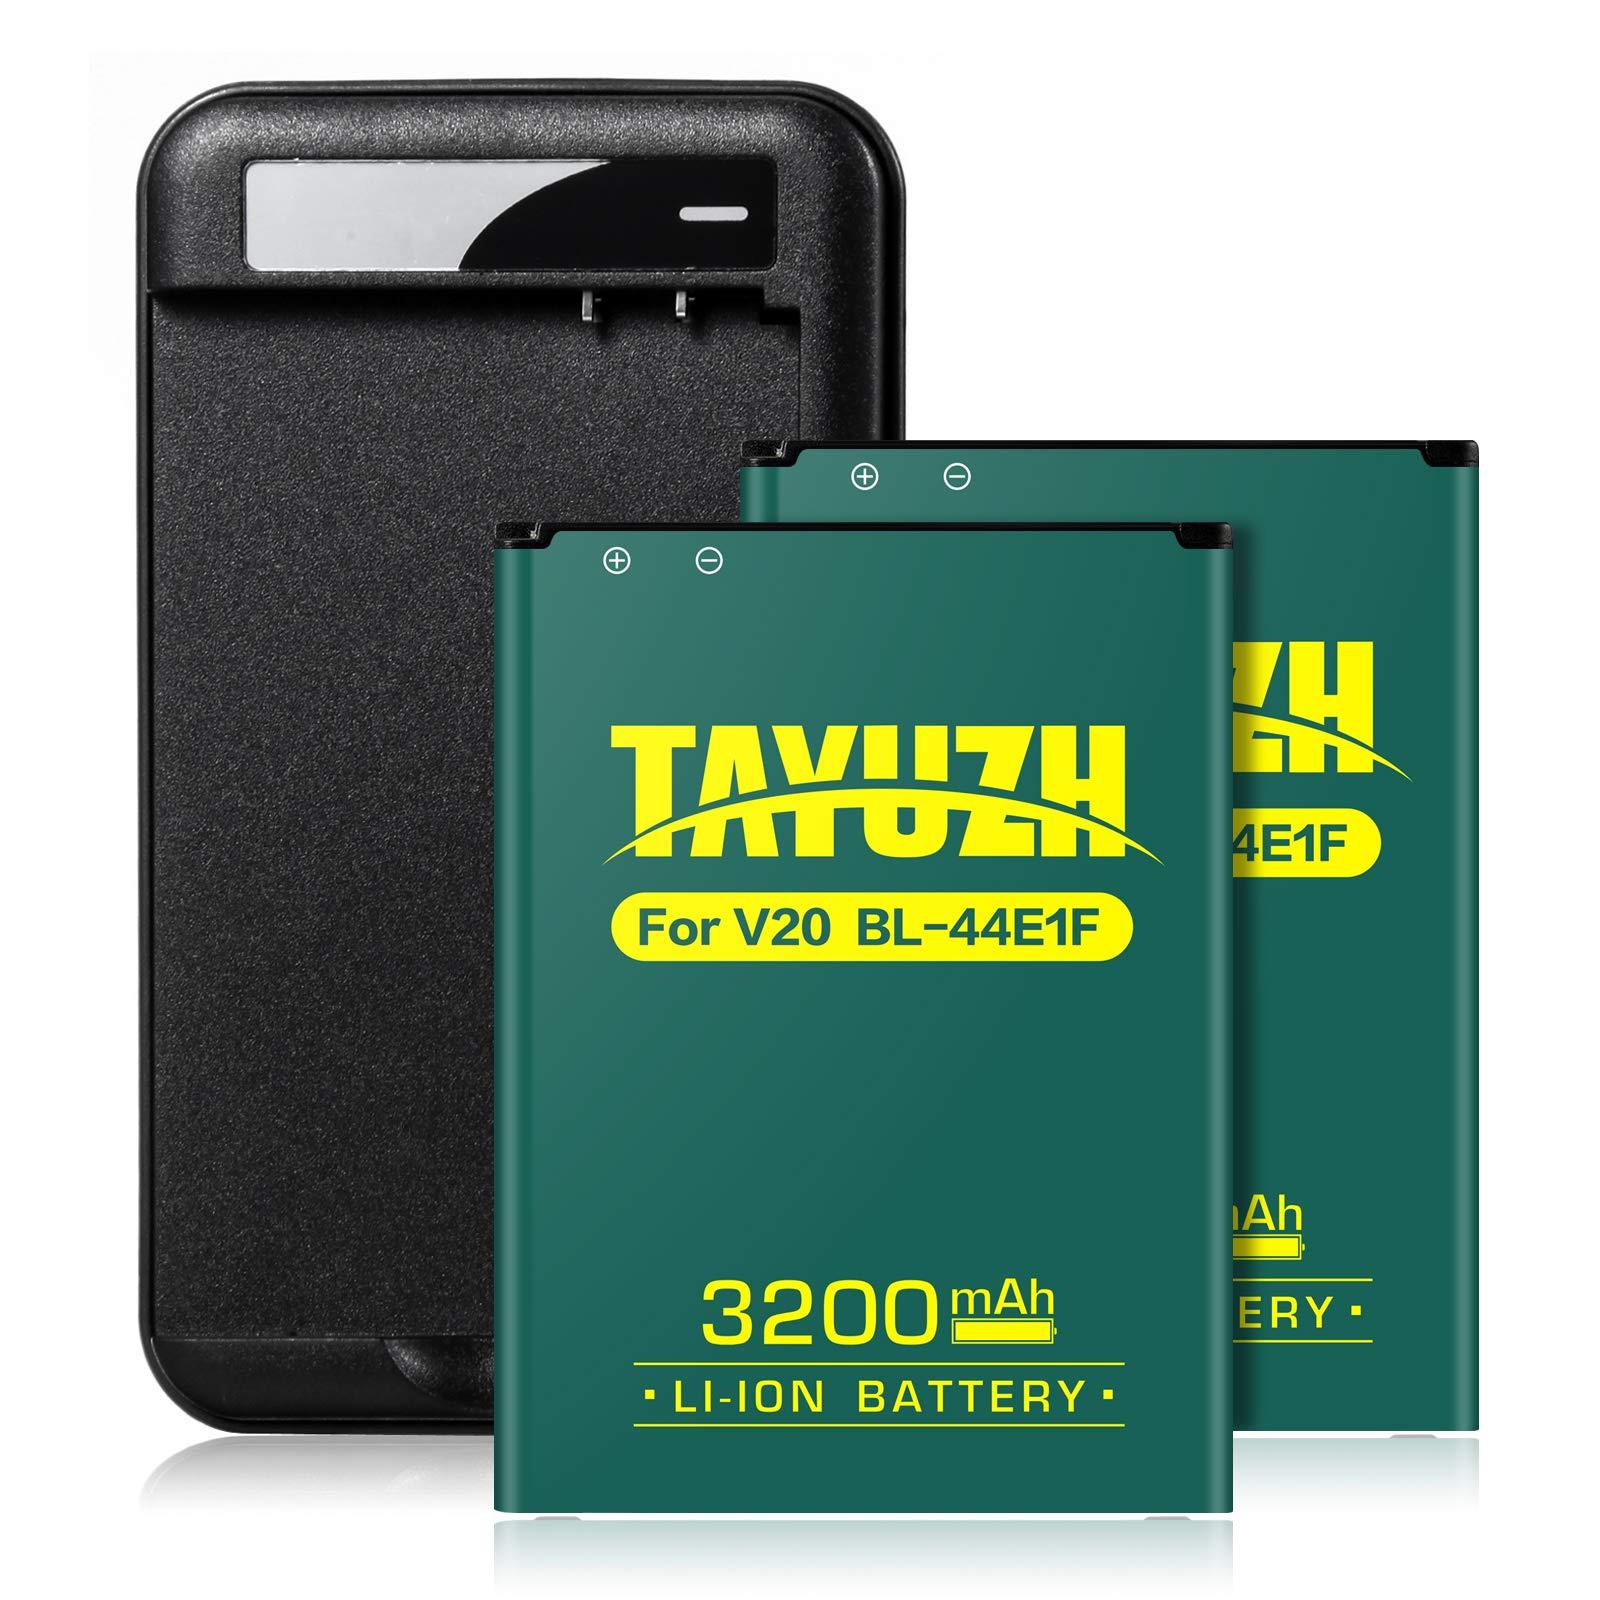 Bateria Celular TAYUZH LG V20 | 2X 3200mAh Li ion con Wall Charger para LG V20 BL 44E1F H910 H918 LS997 US996 VS995 | V2